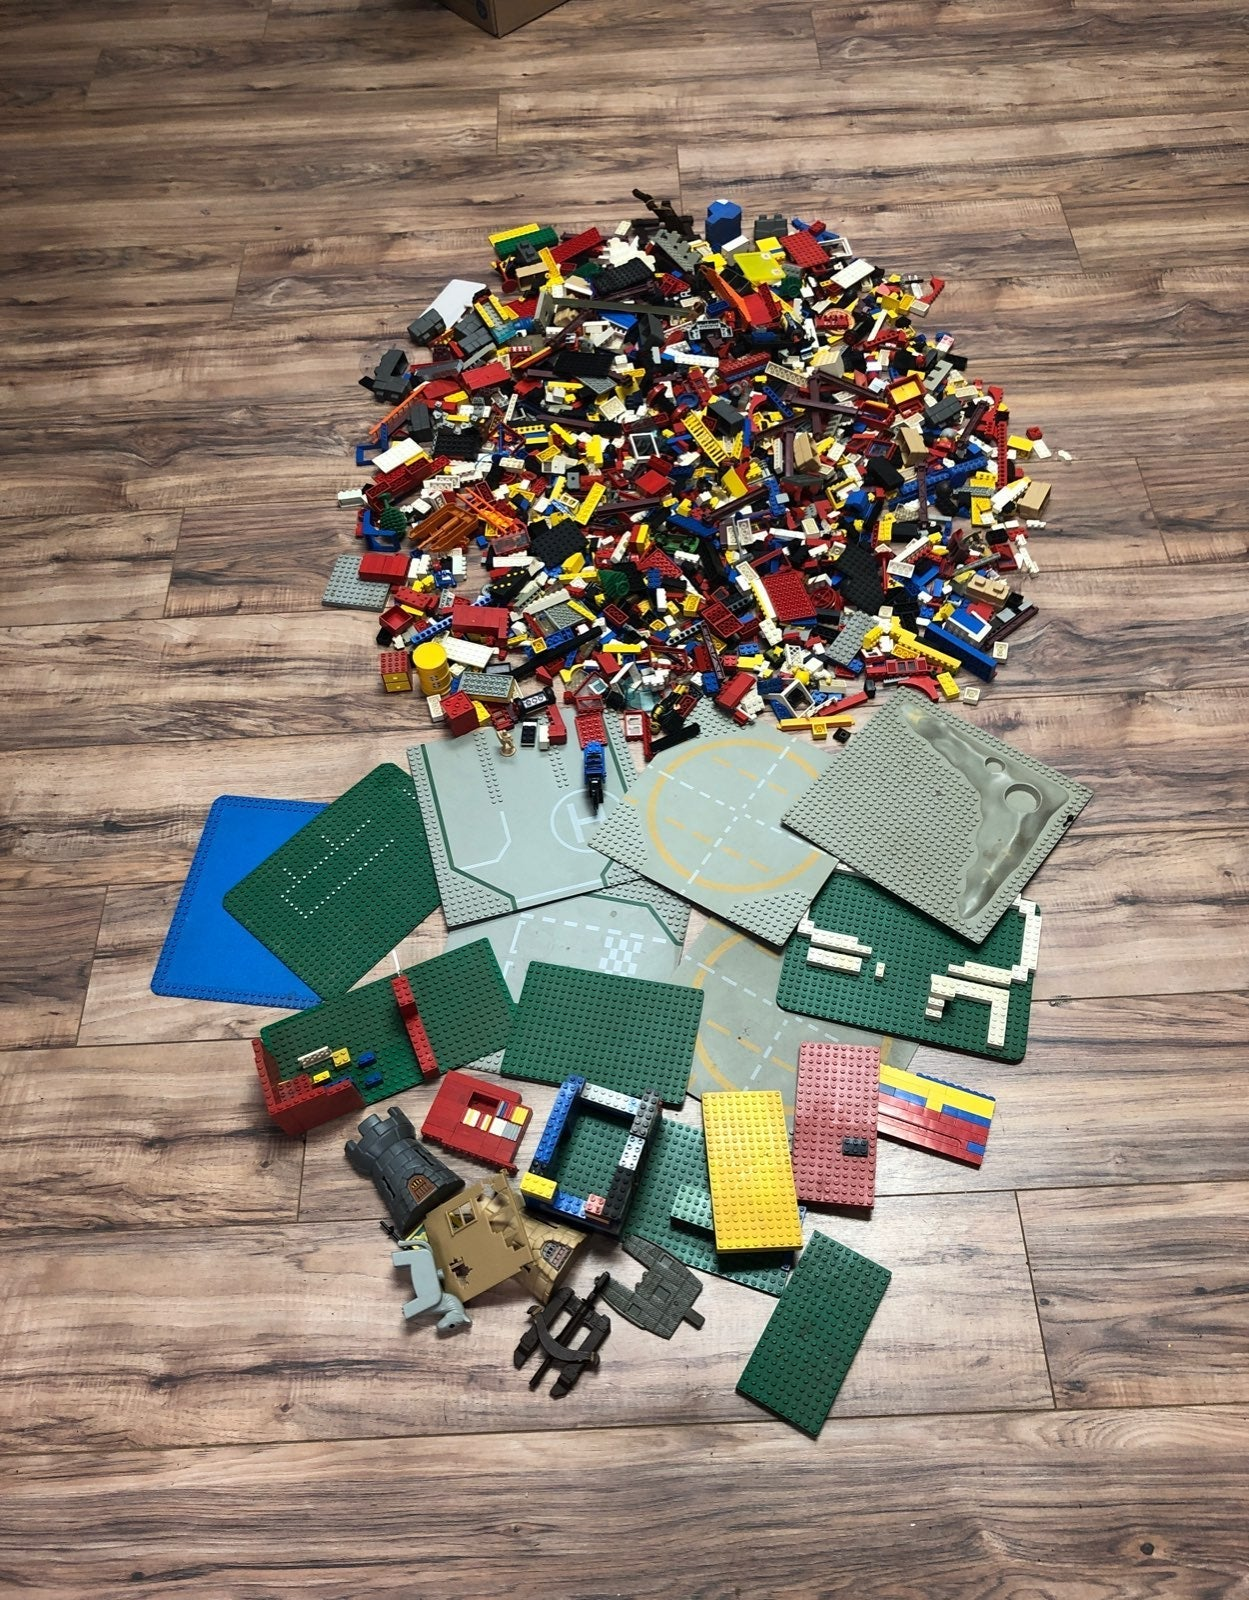 13 lb Box of Legos